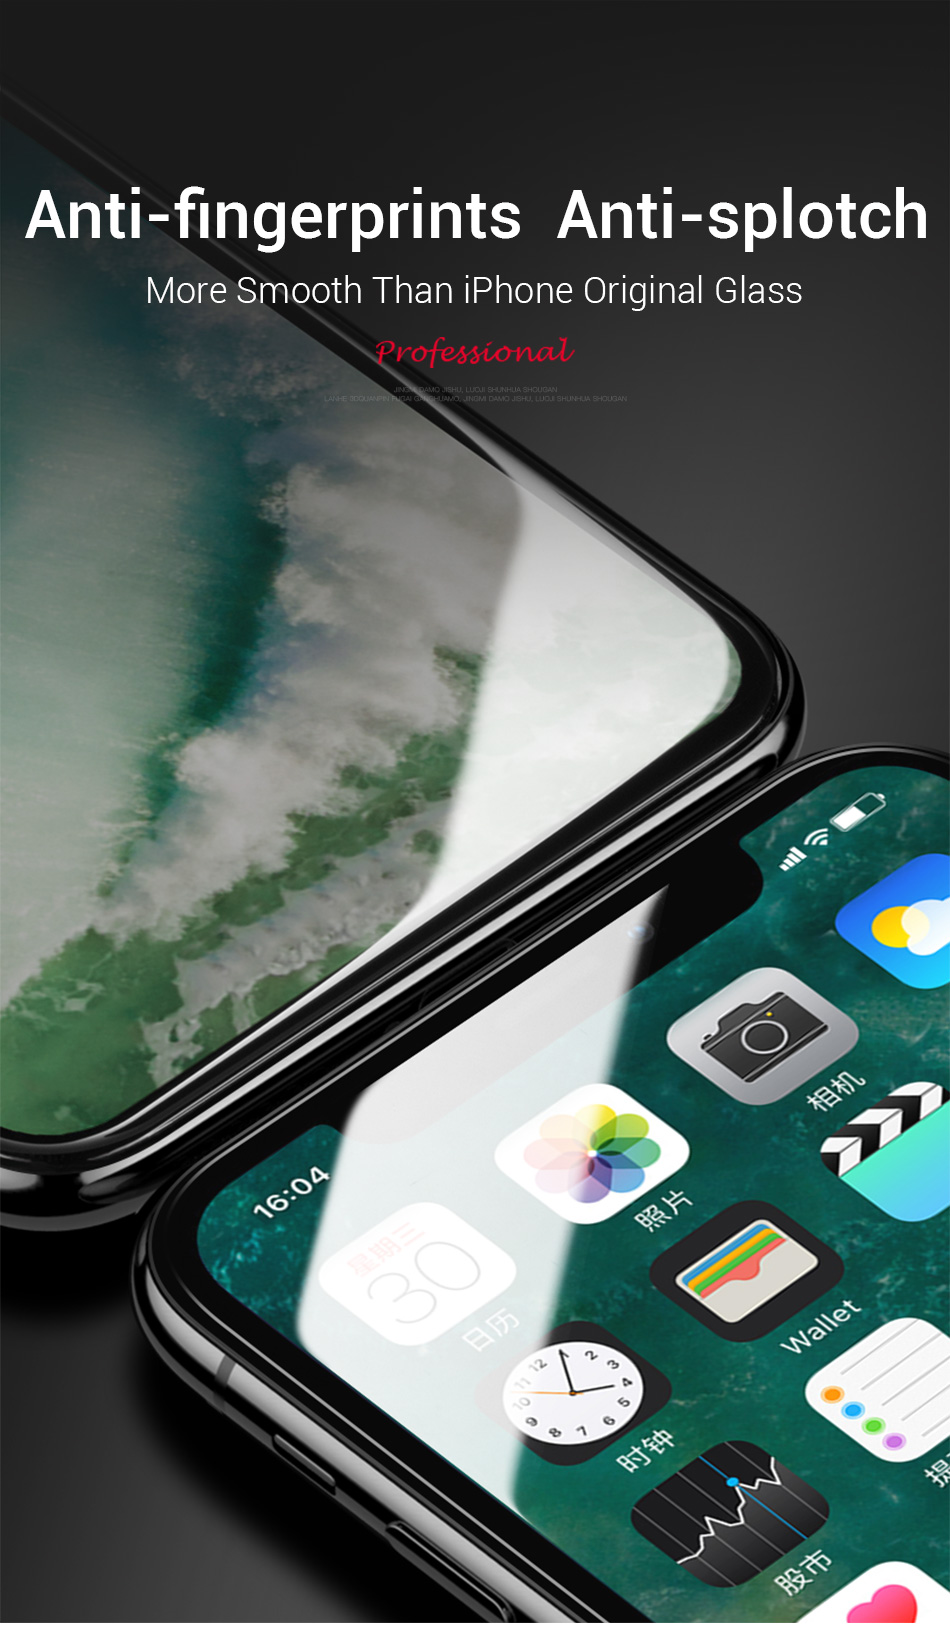 iPhone-X---180607_06